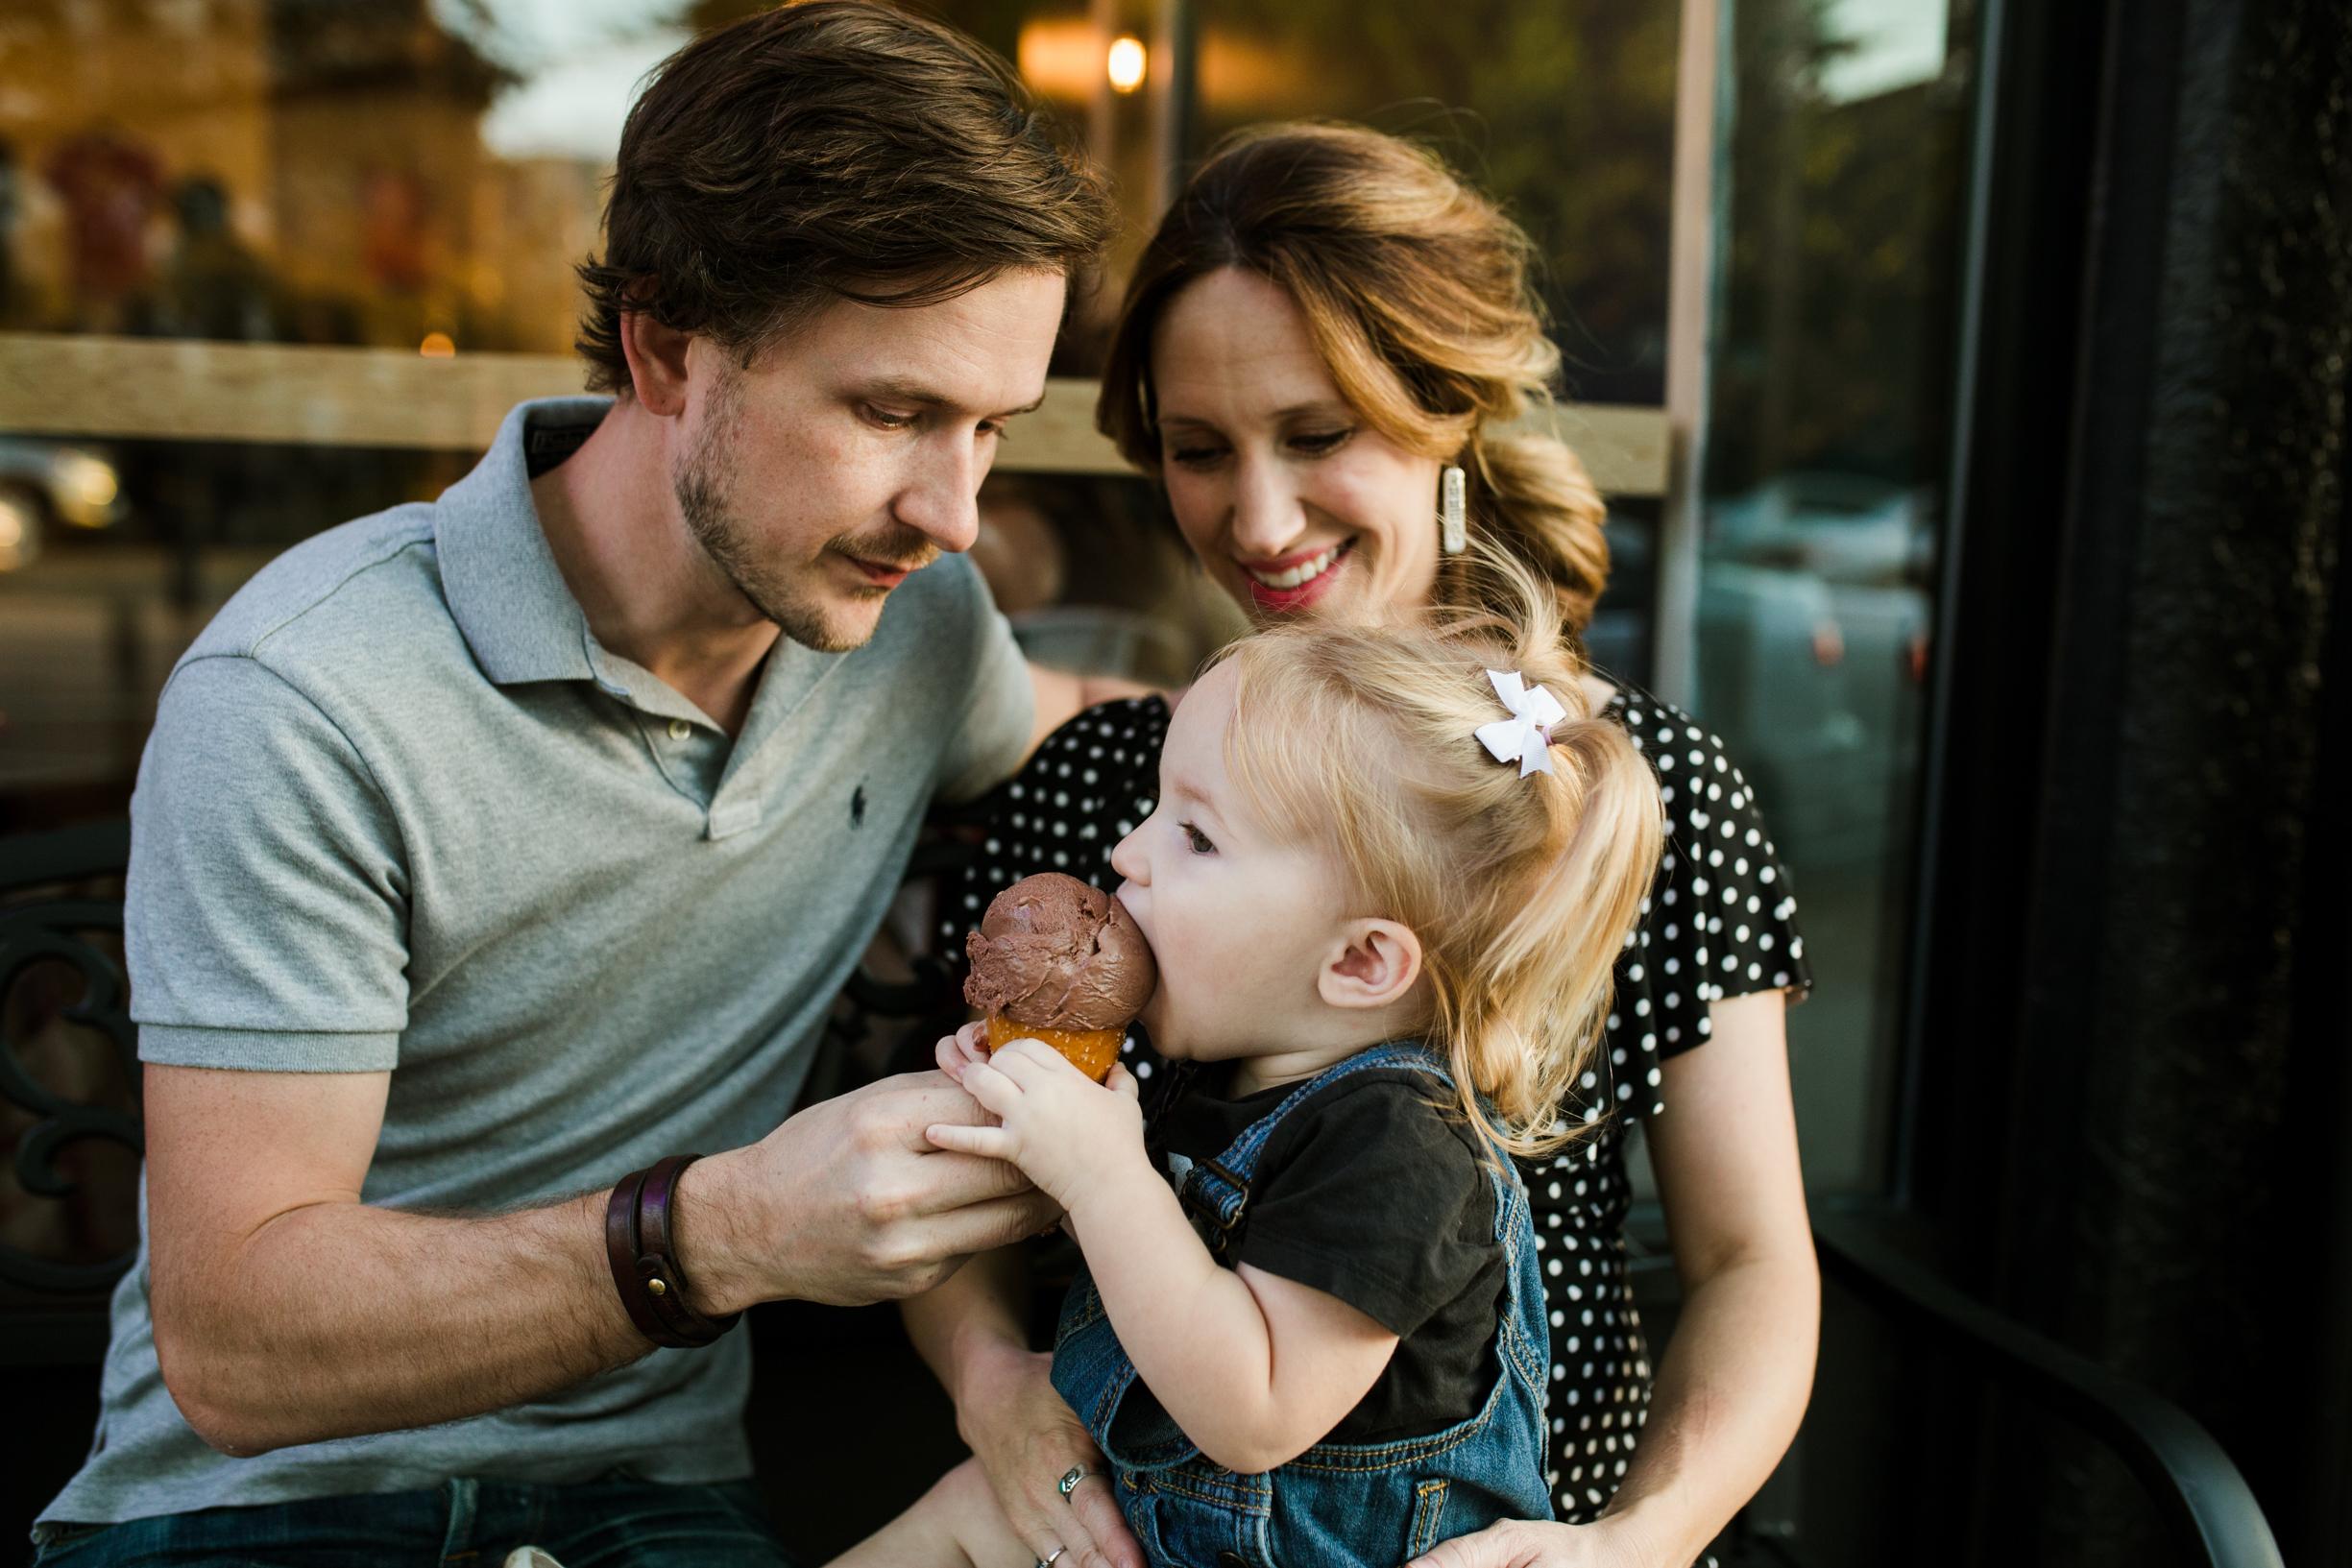 Disney Family 2017 (baby bump) WEBSITE Crystal Ludwick Photo (60 of 68).jpg